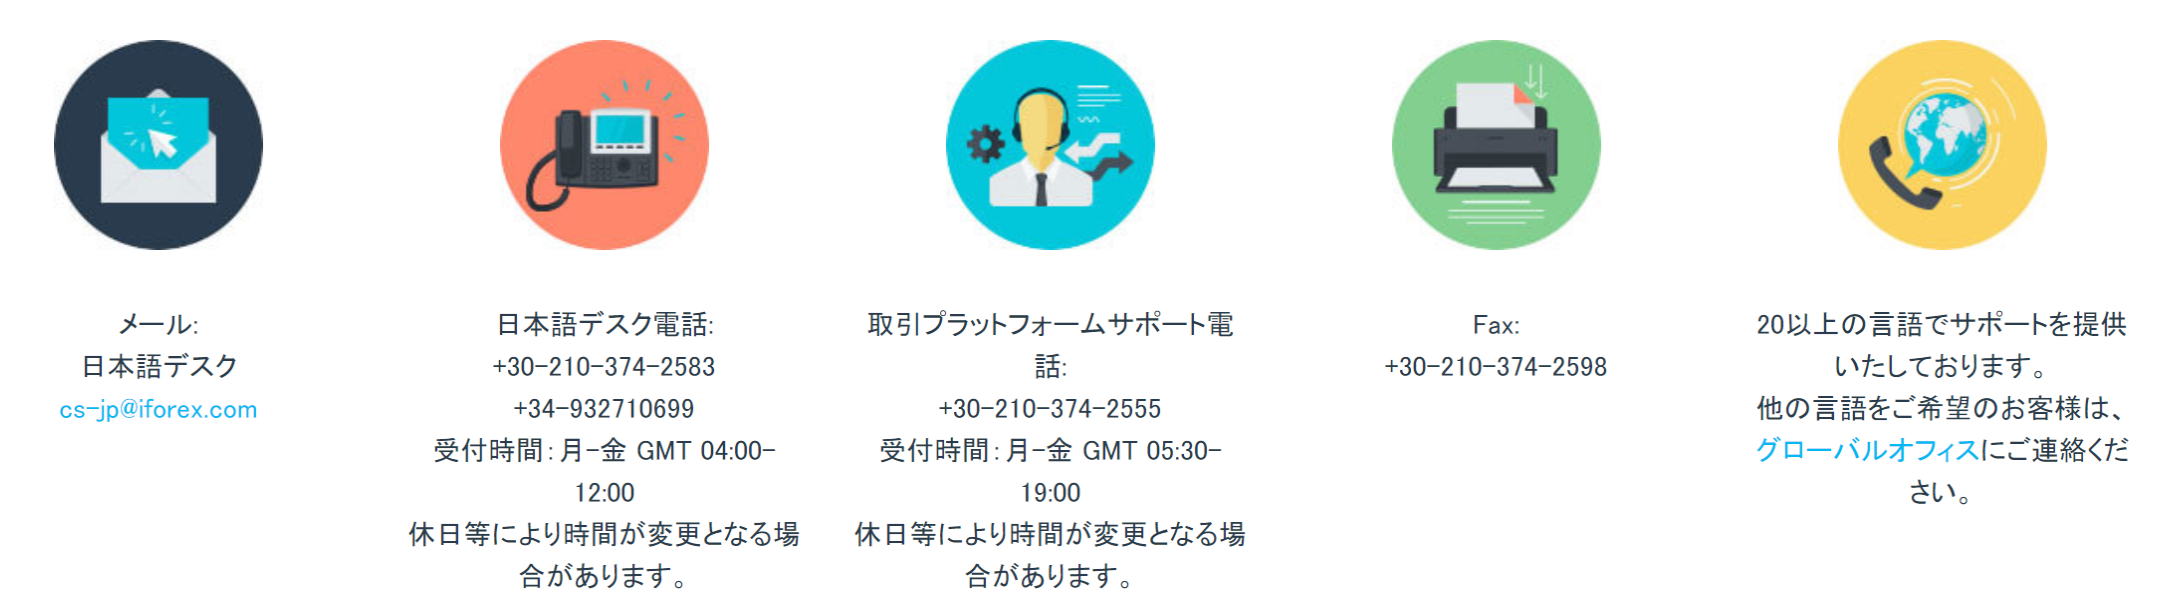 iFOREX サポート連絡先